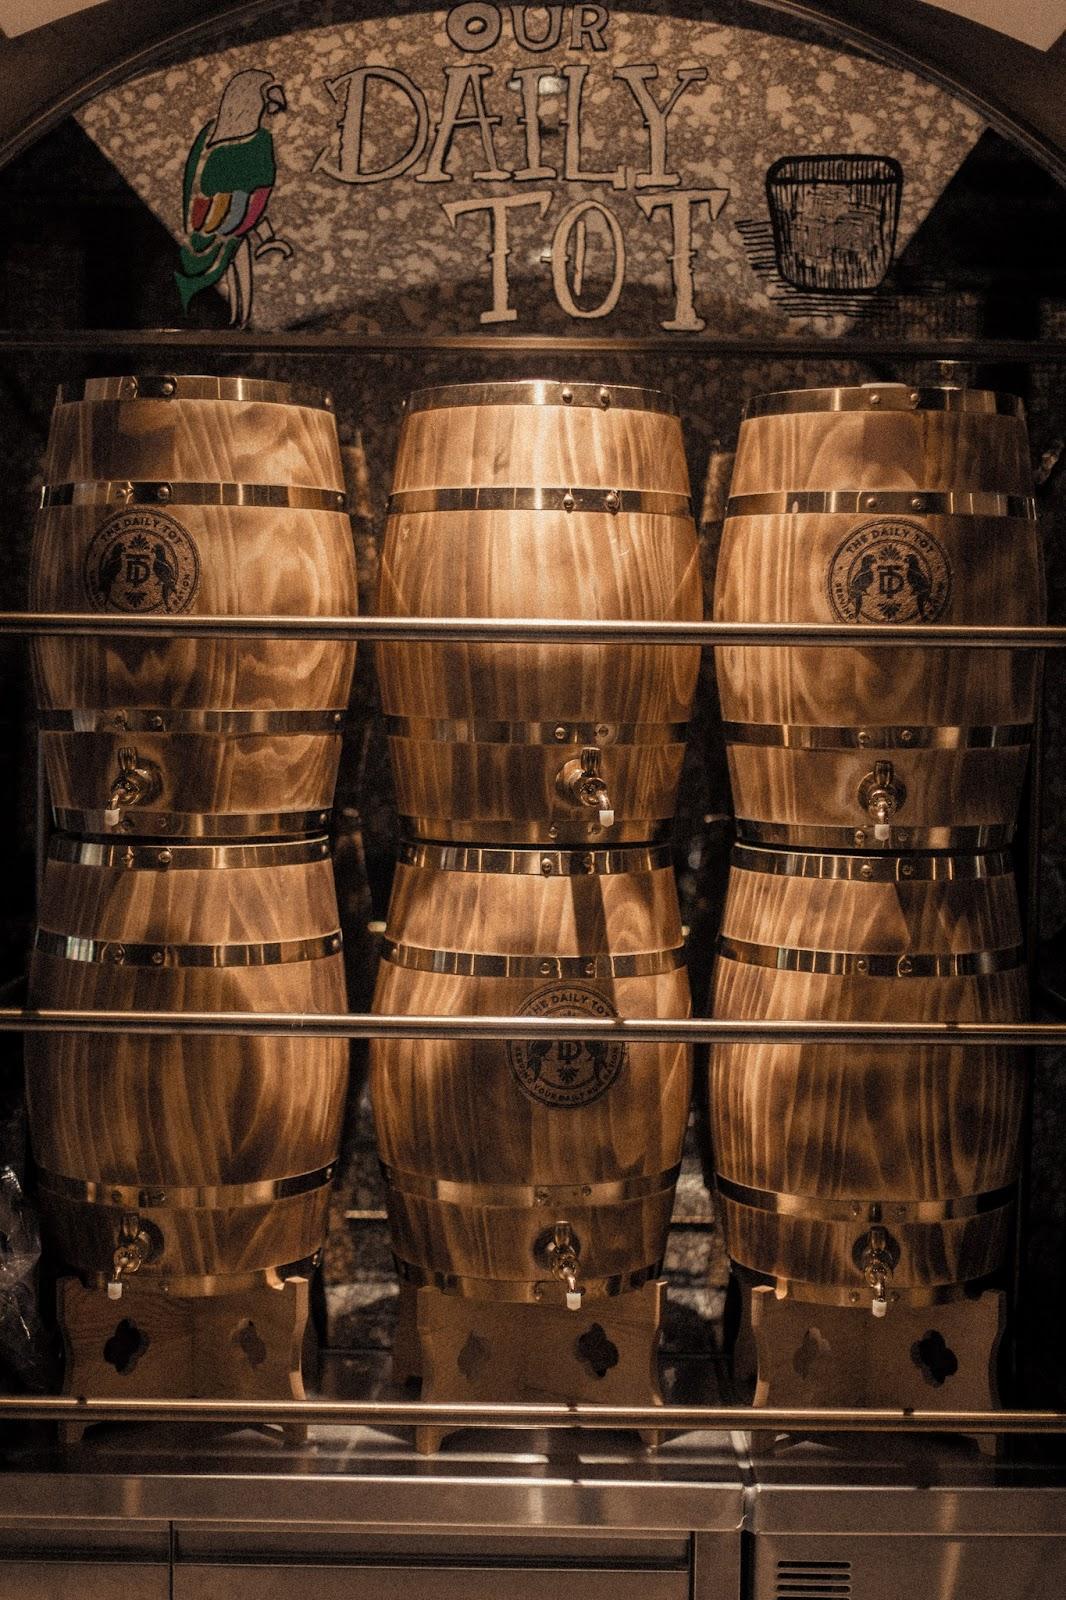 rum casks in Hong Kong's The Daily Tot